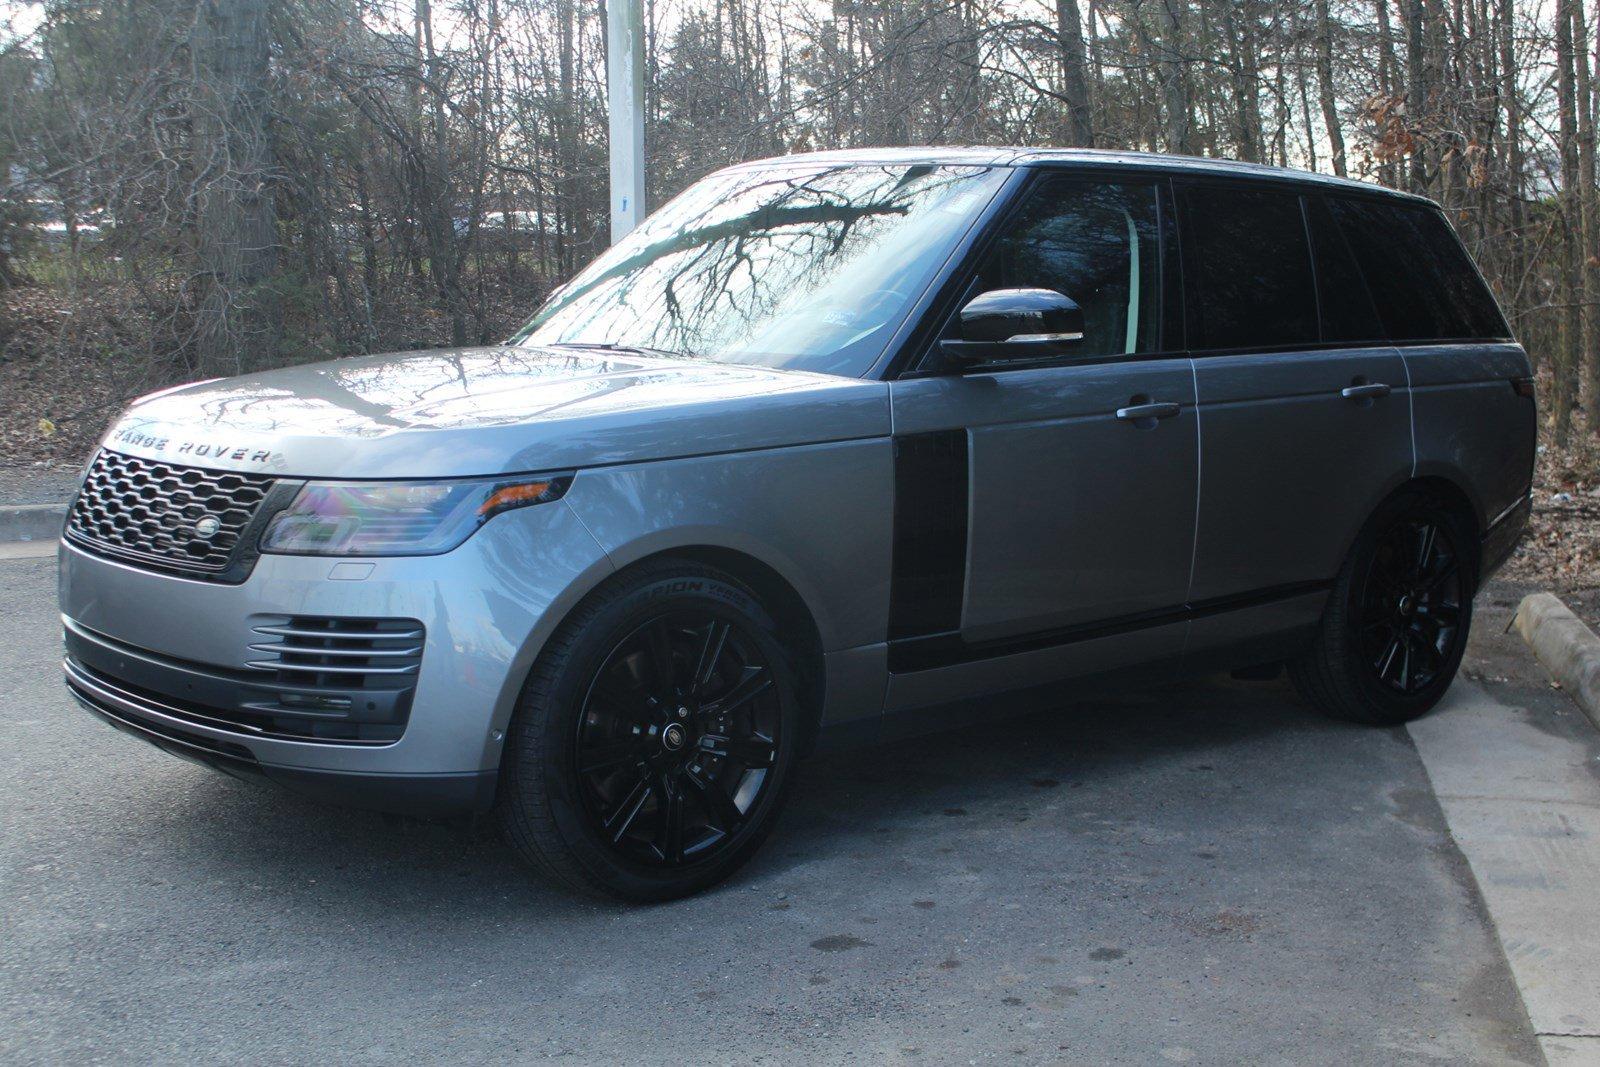 2020 Land Rover Range Rover HSE Hybrid image